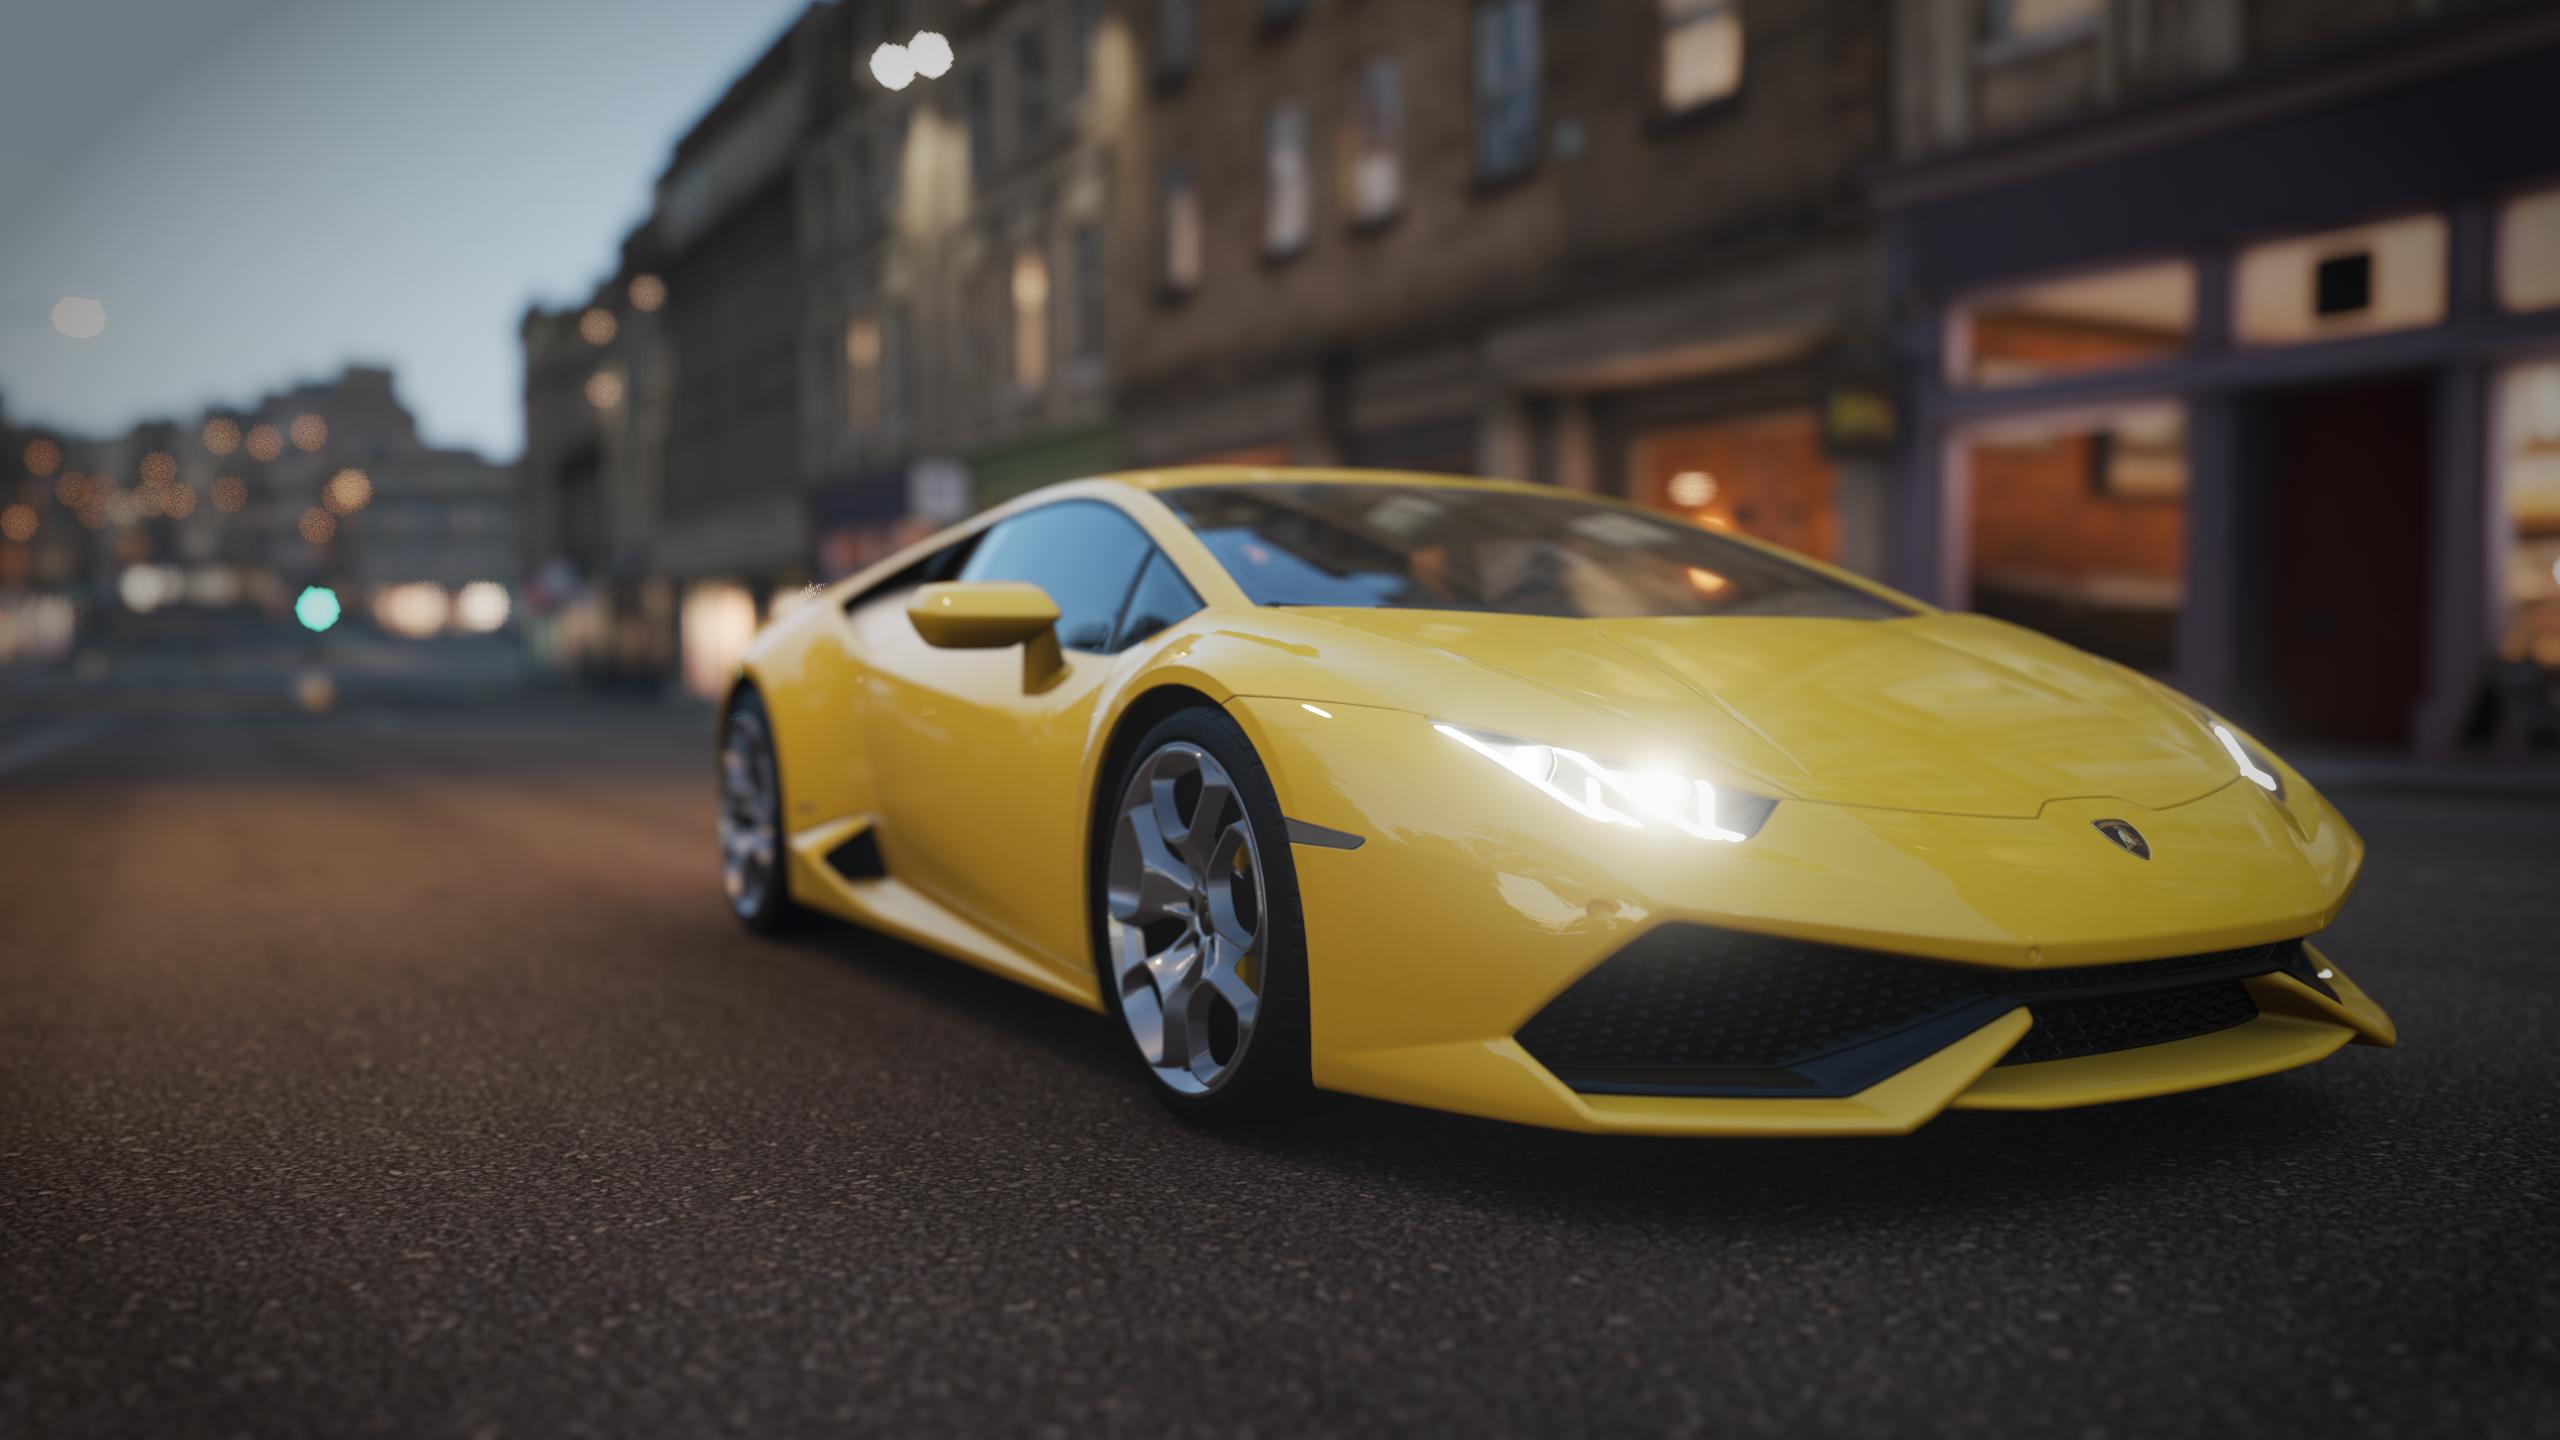 Forza Horizon 4 Car Lamborghini Yellow Video Games 2560x1440